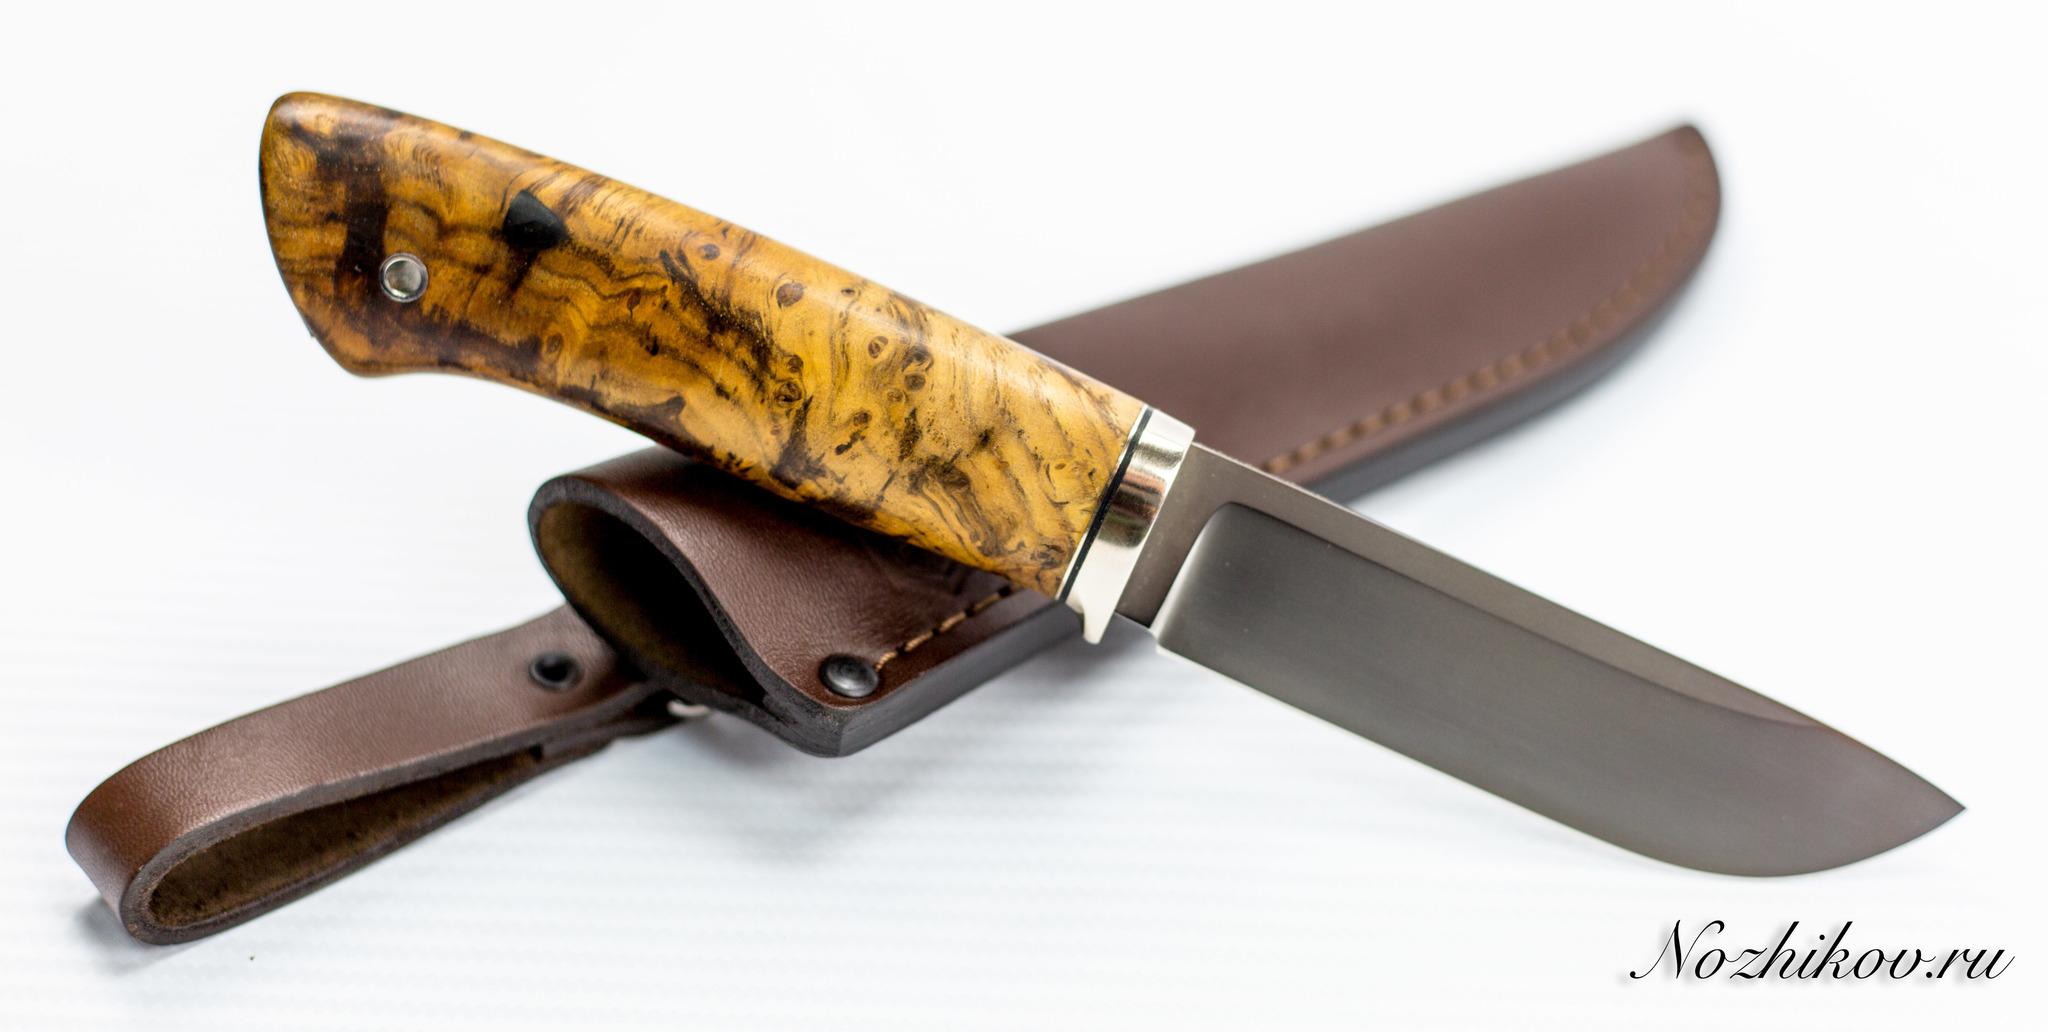 Нож Нырок, M390, коричневыйНожи Ворсма<br>Нож Клык<br>